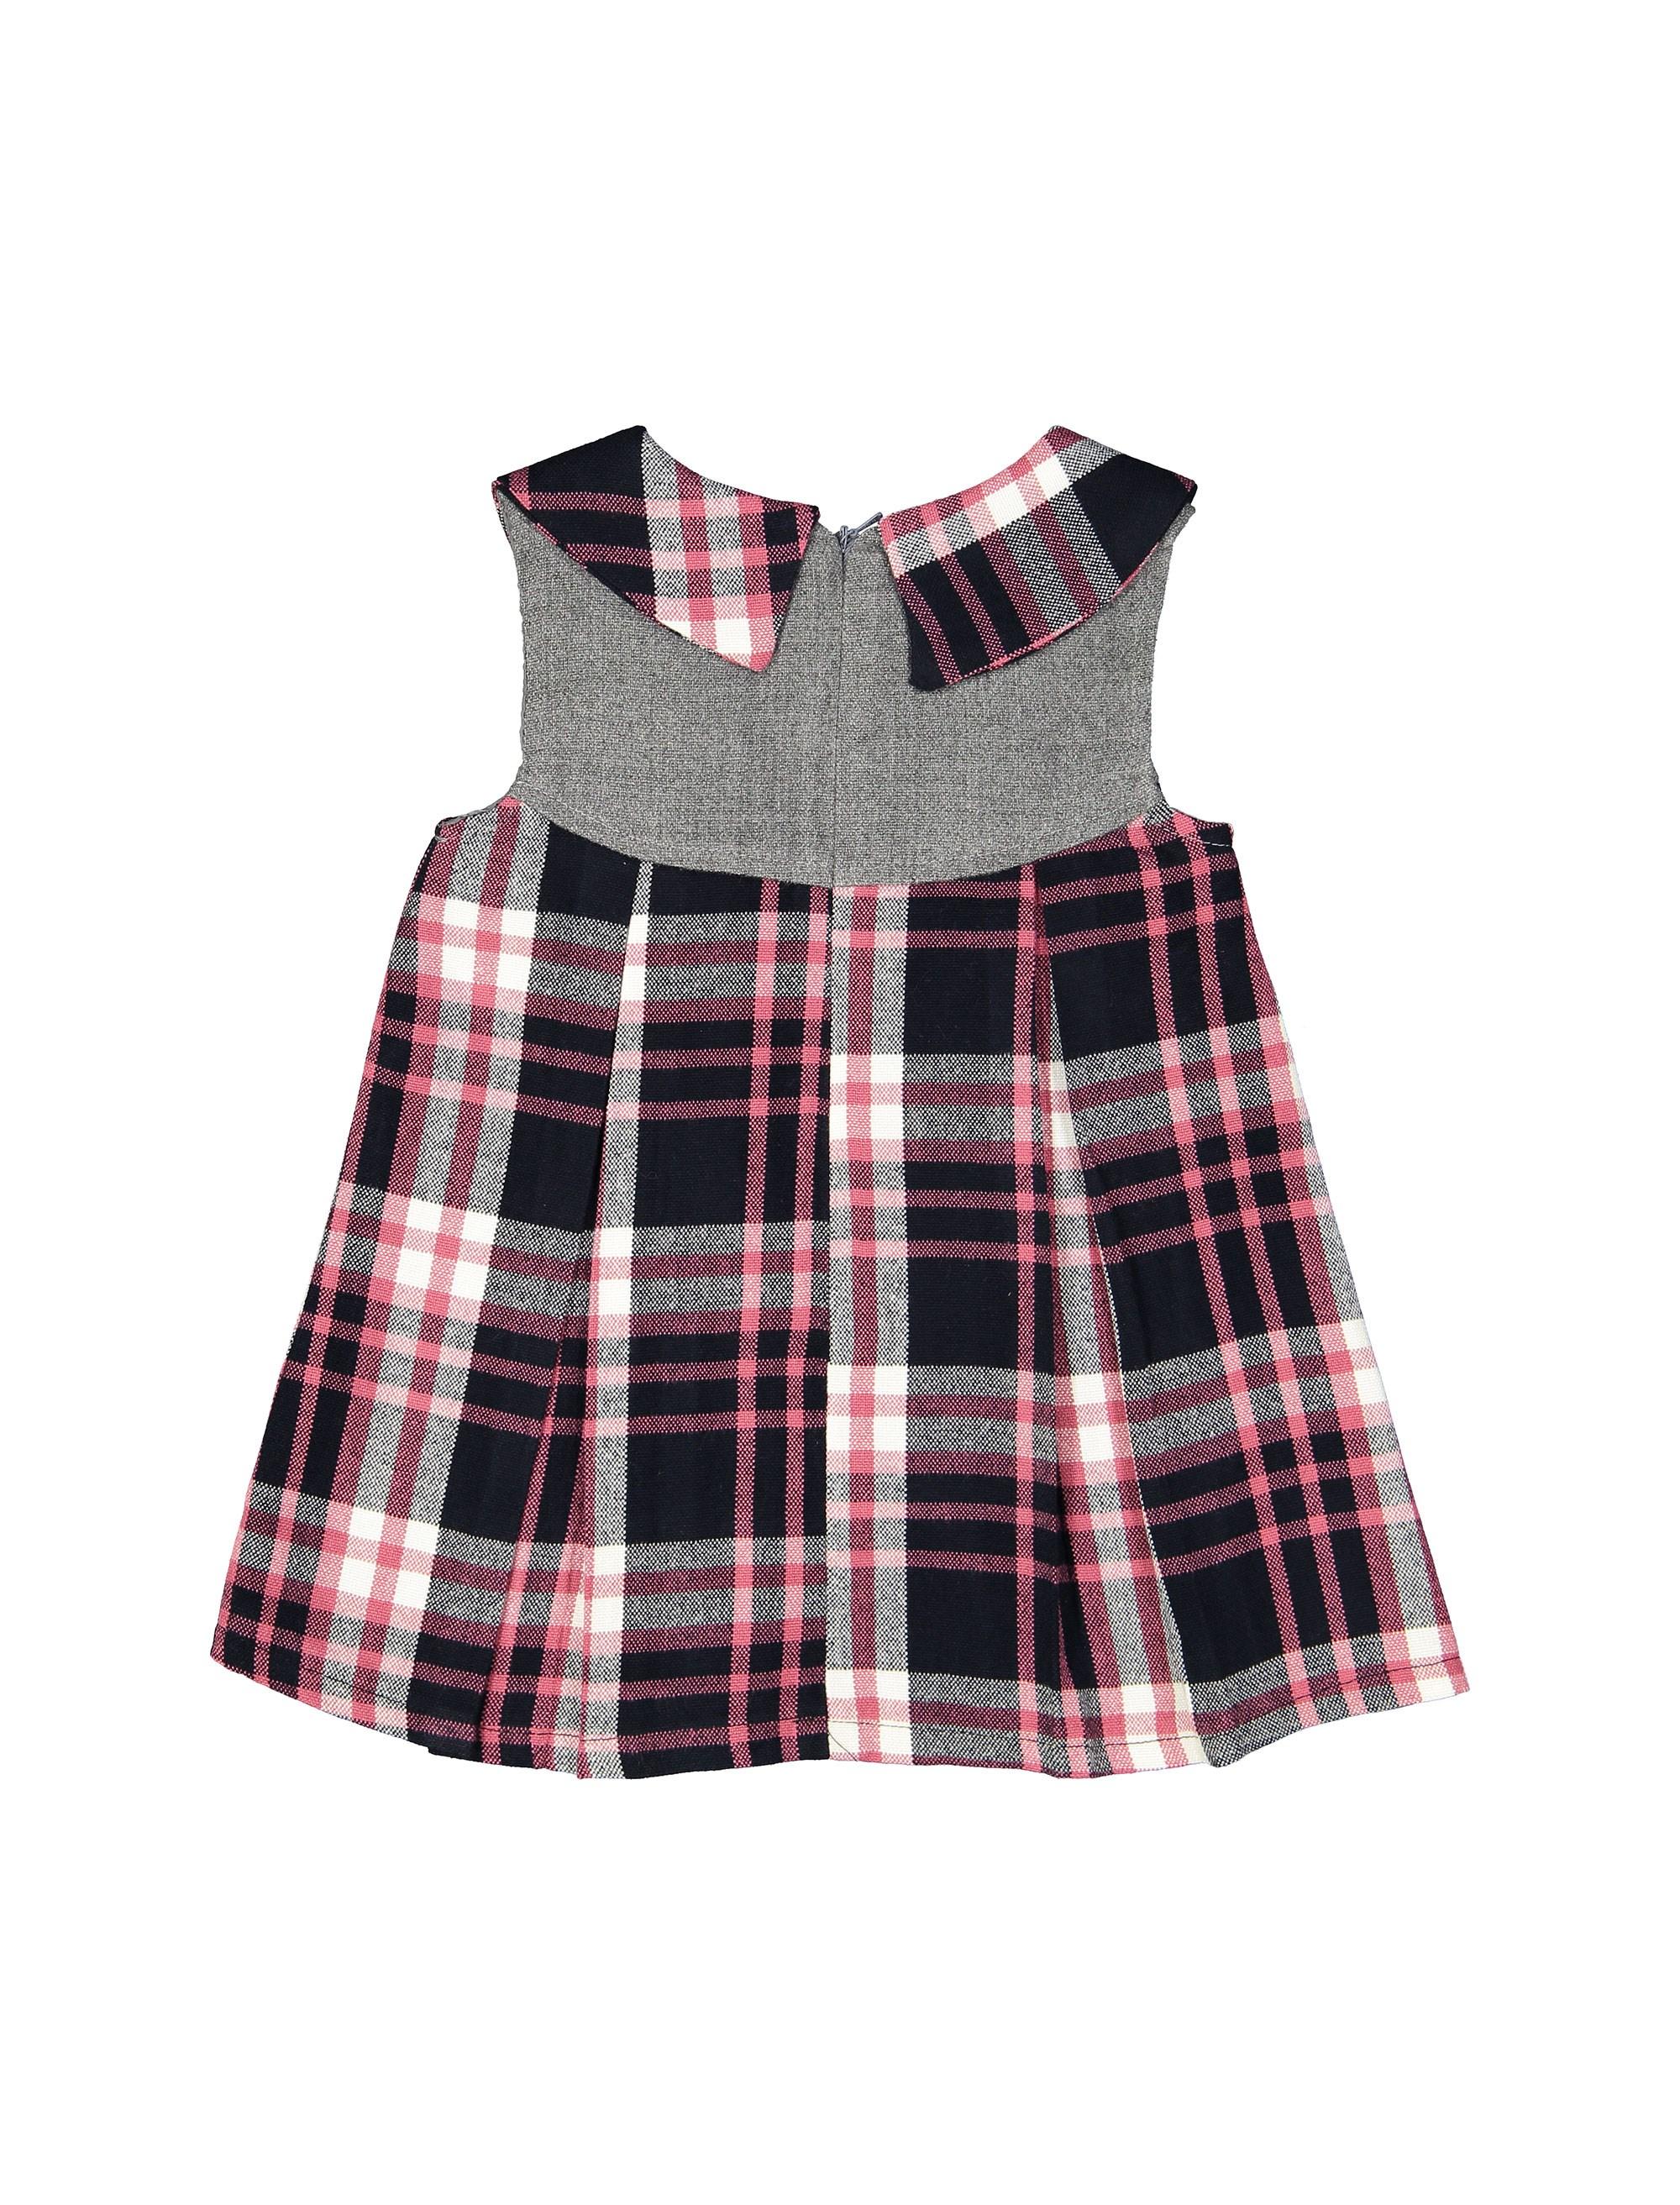 پیراهن روزمره دخترانه مدل 971 - صورتي - 2